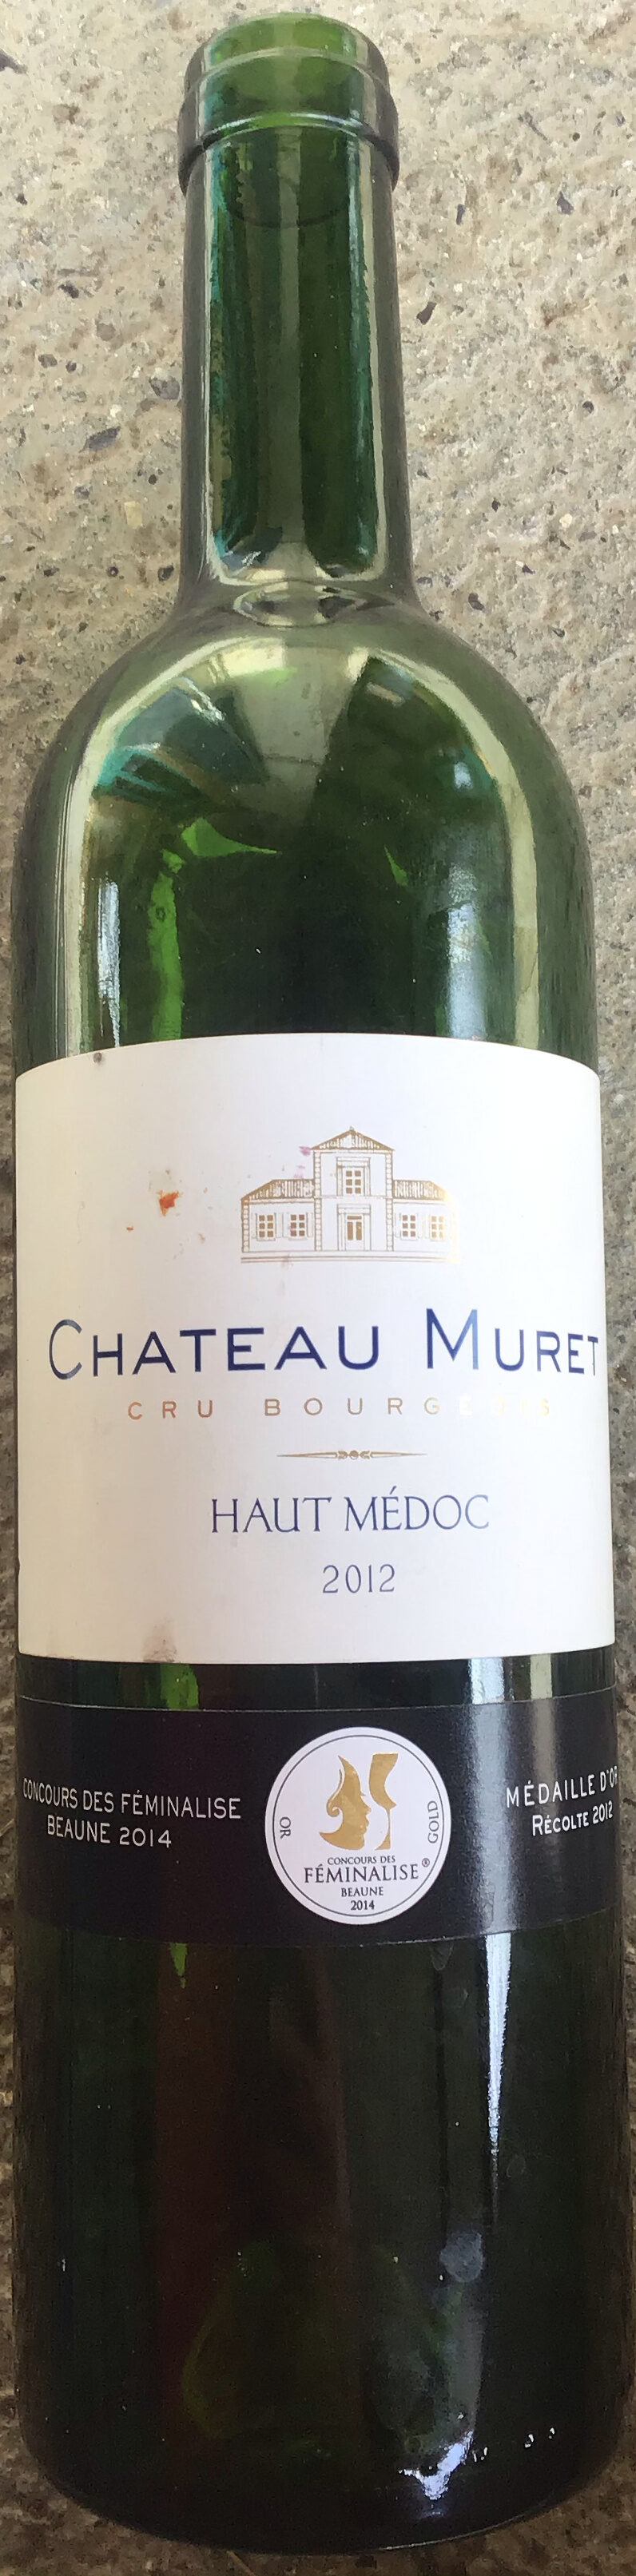 Haut Médoc 2012 - Product - fr